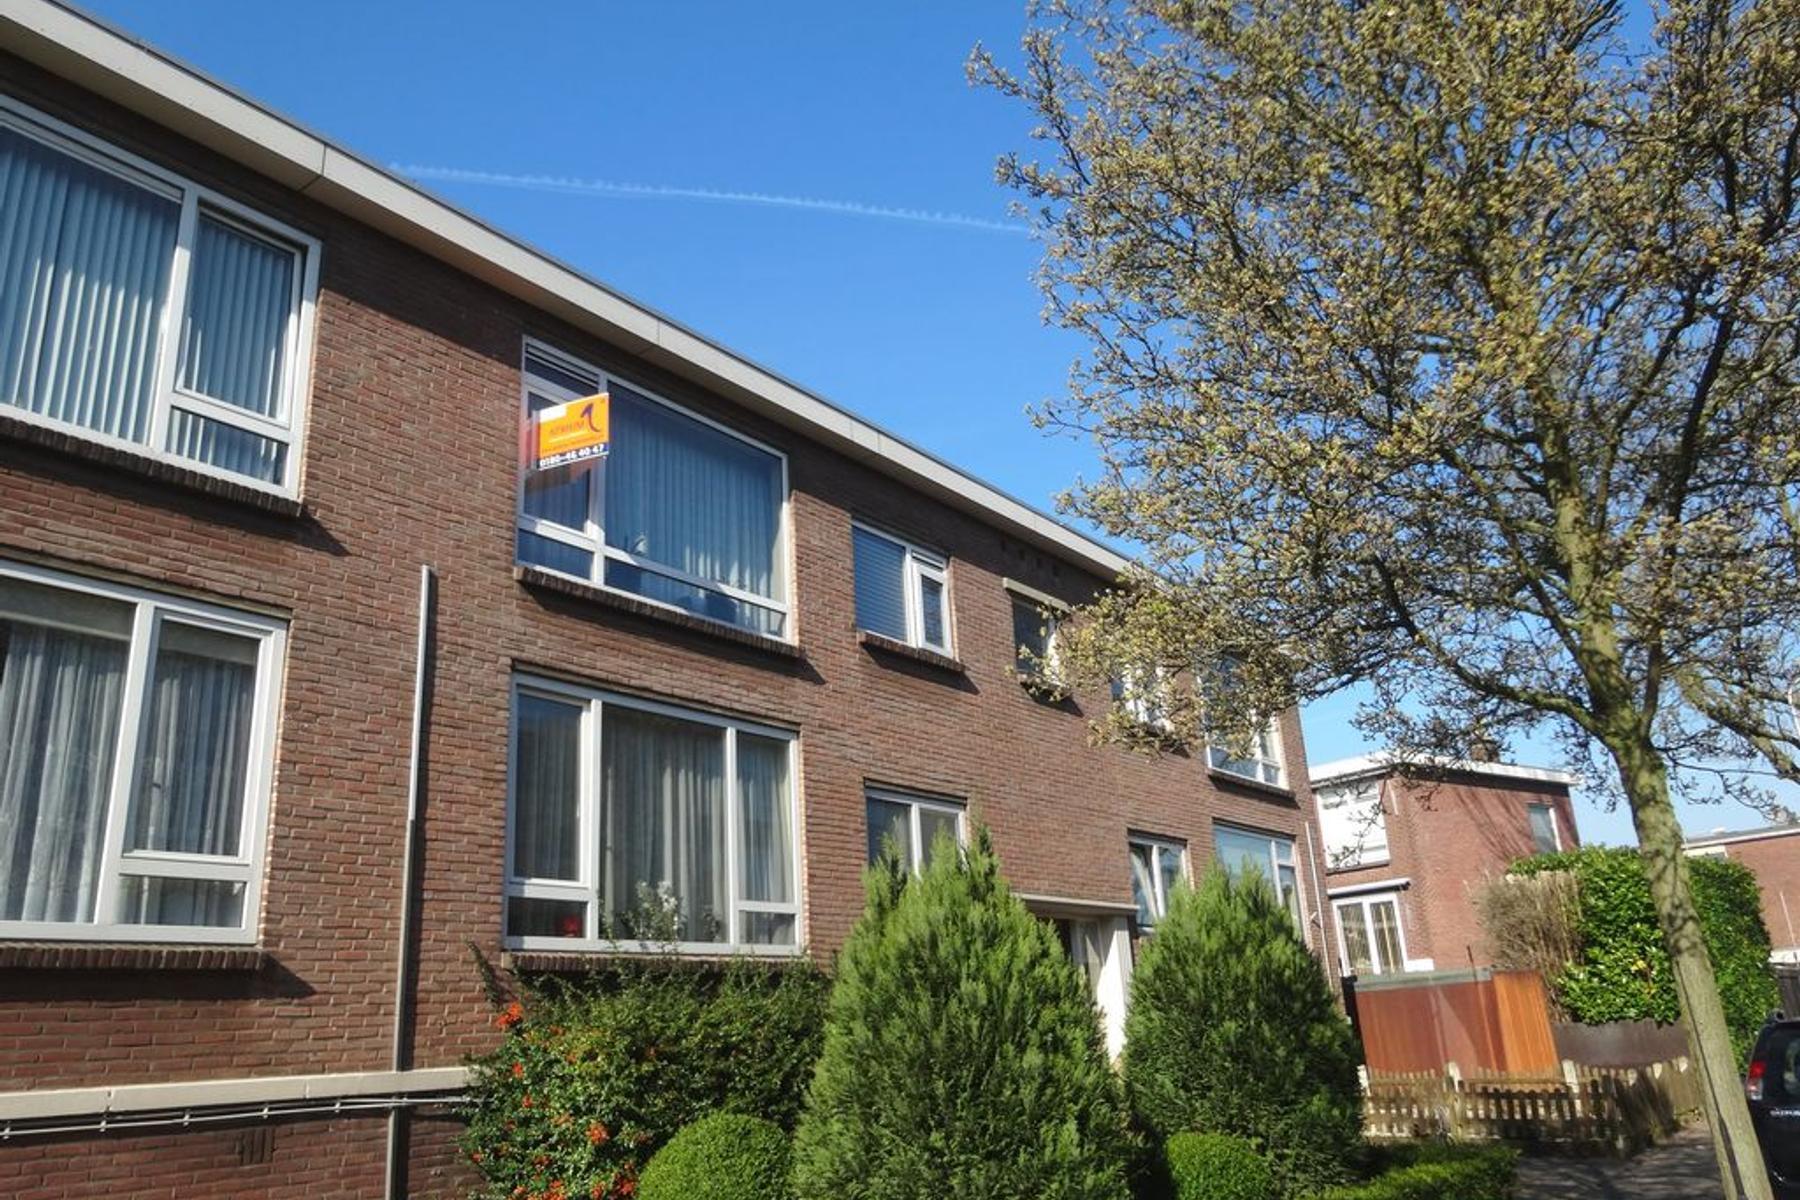 Dr. Schaepmanstraat 21 in Ridderkerk 2982 AD